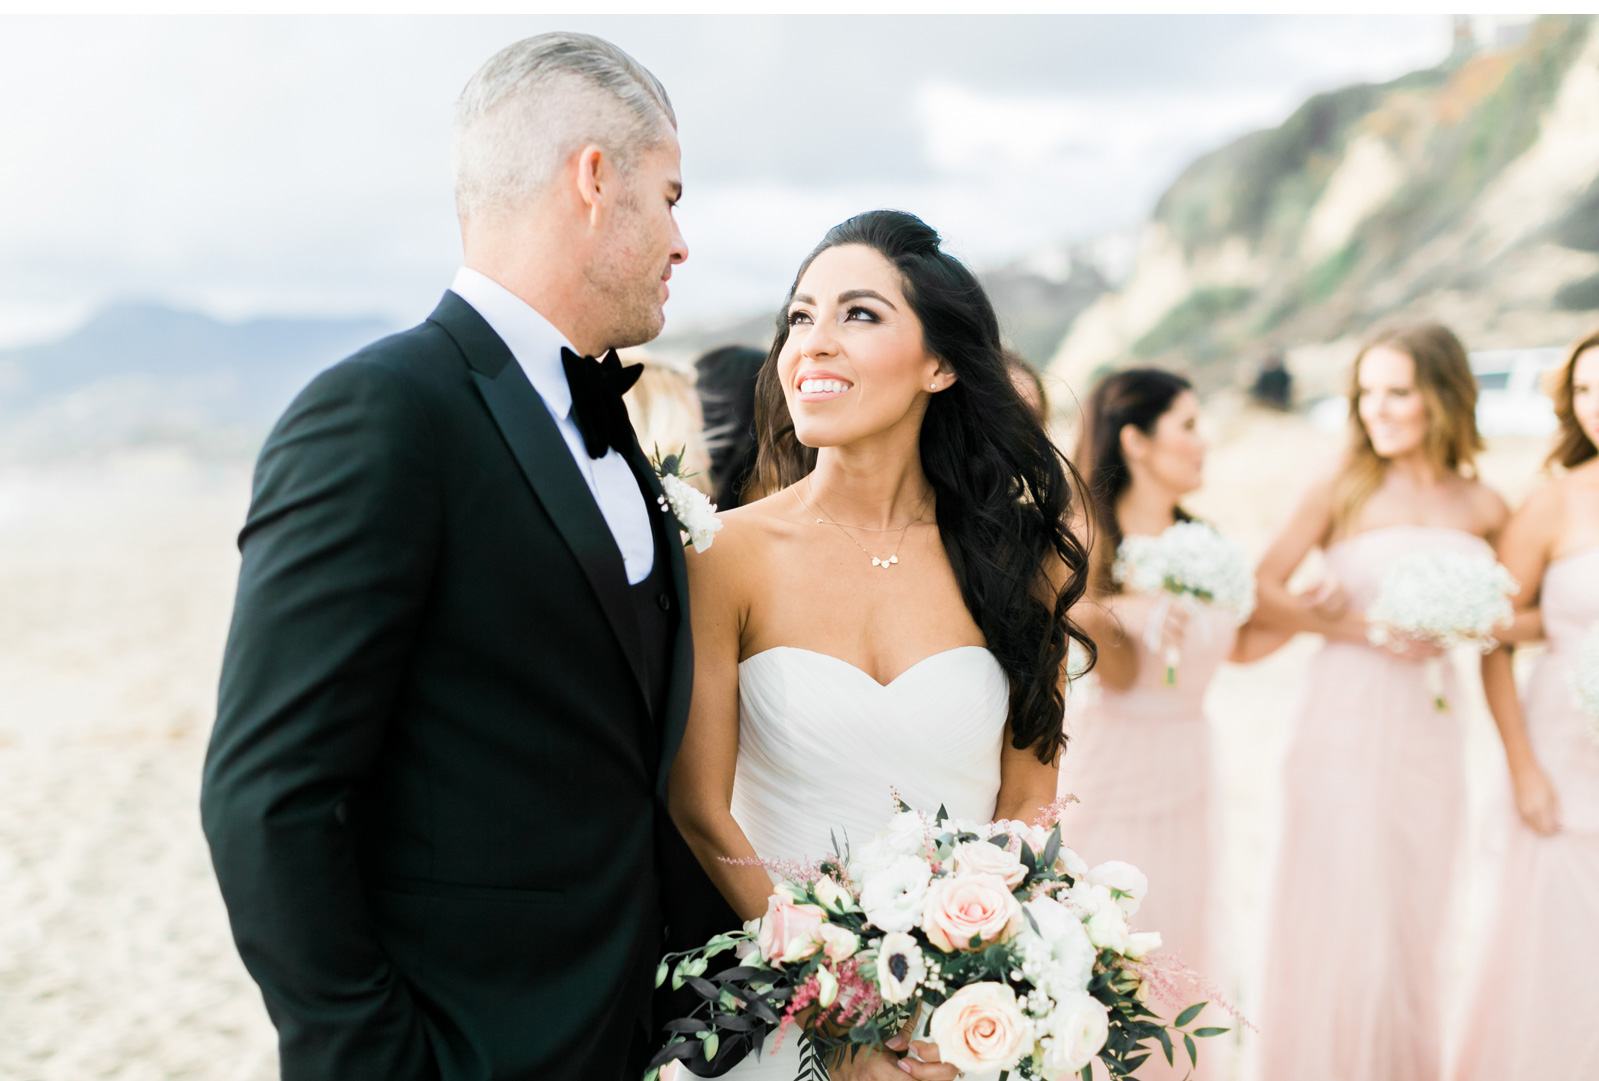 Rod-and-Lorin-Brewster-Style-Me-Pretty-Malibu-Beach-Wedding-Natalie-Schutt-Photography_20.jpg